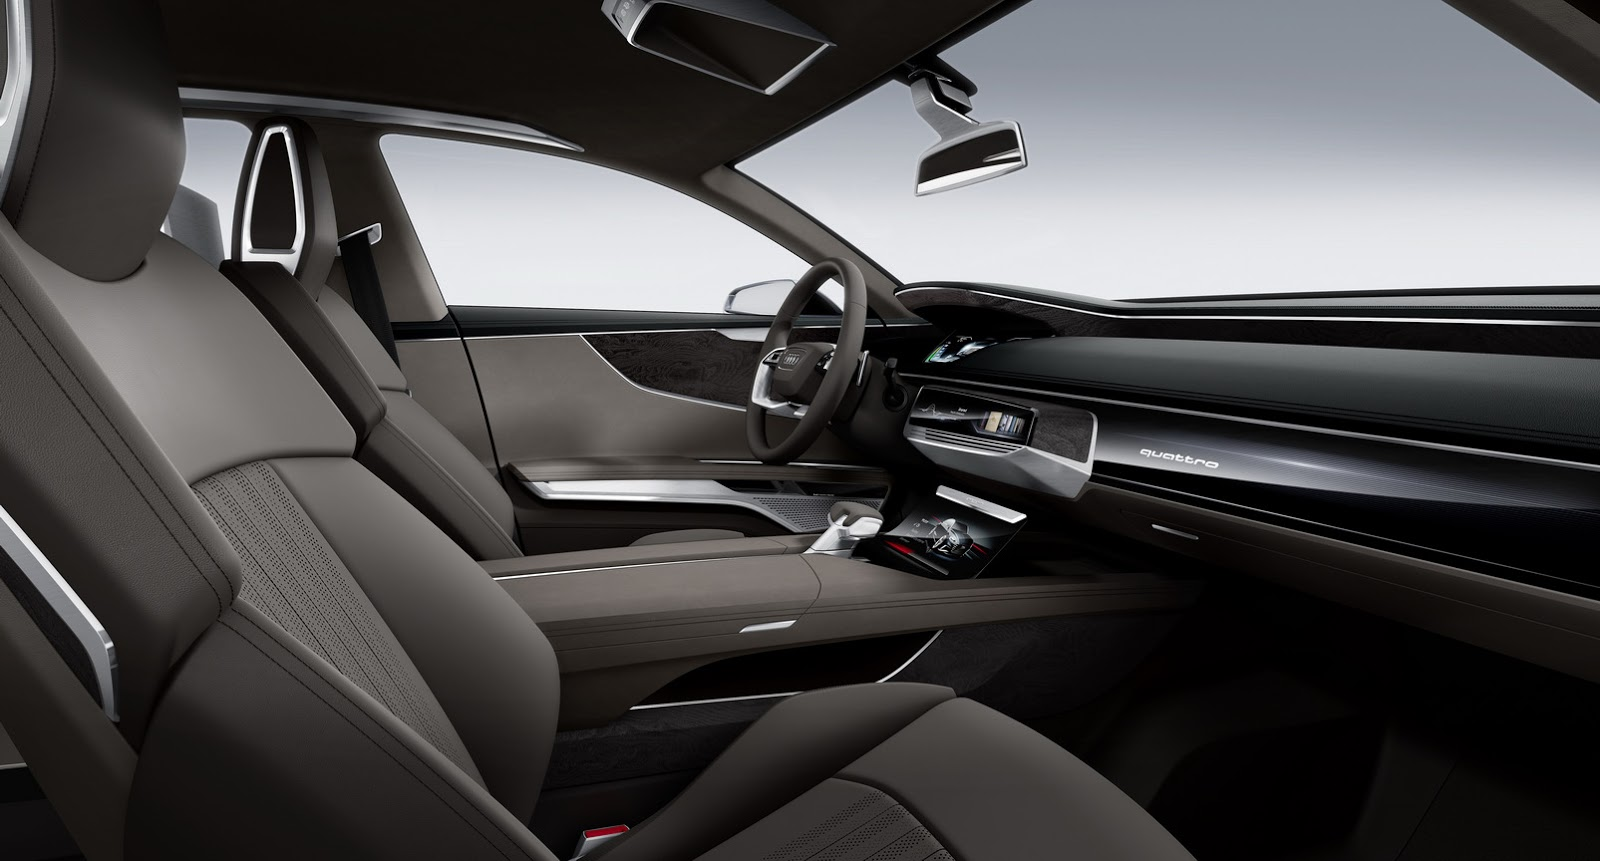 Audi-Prologue-Avant-Concept-7.jpg